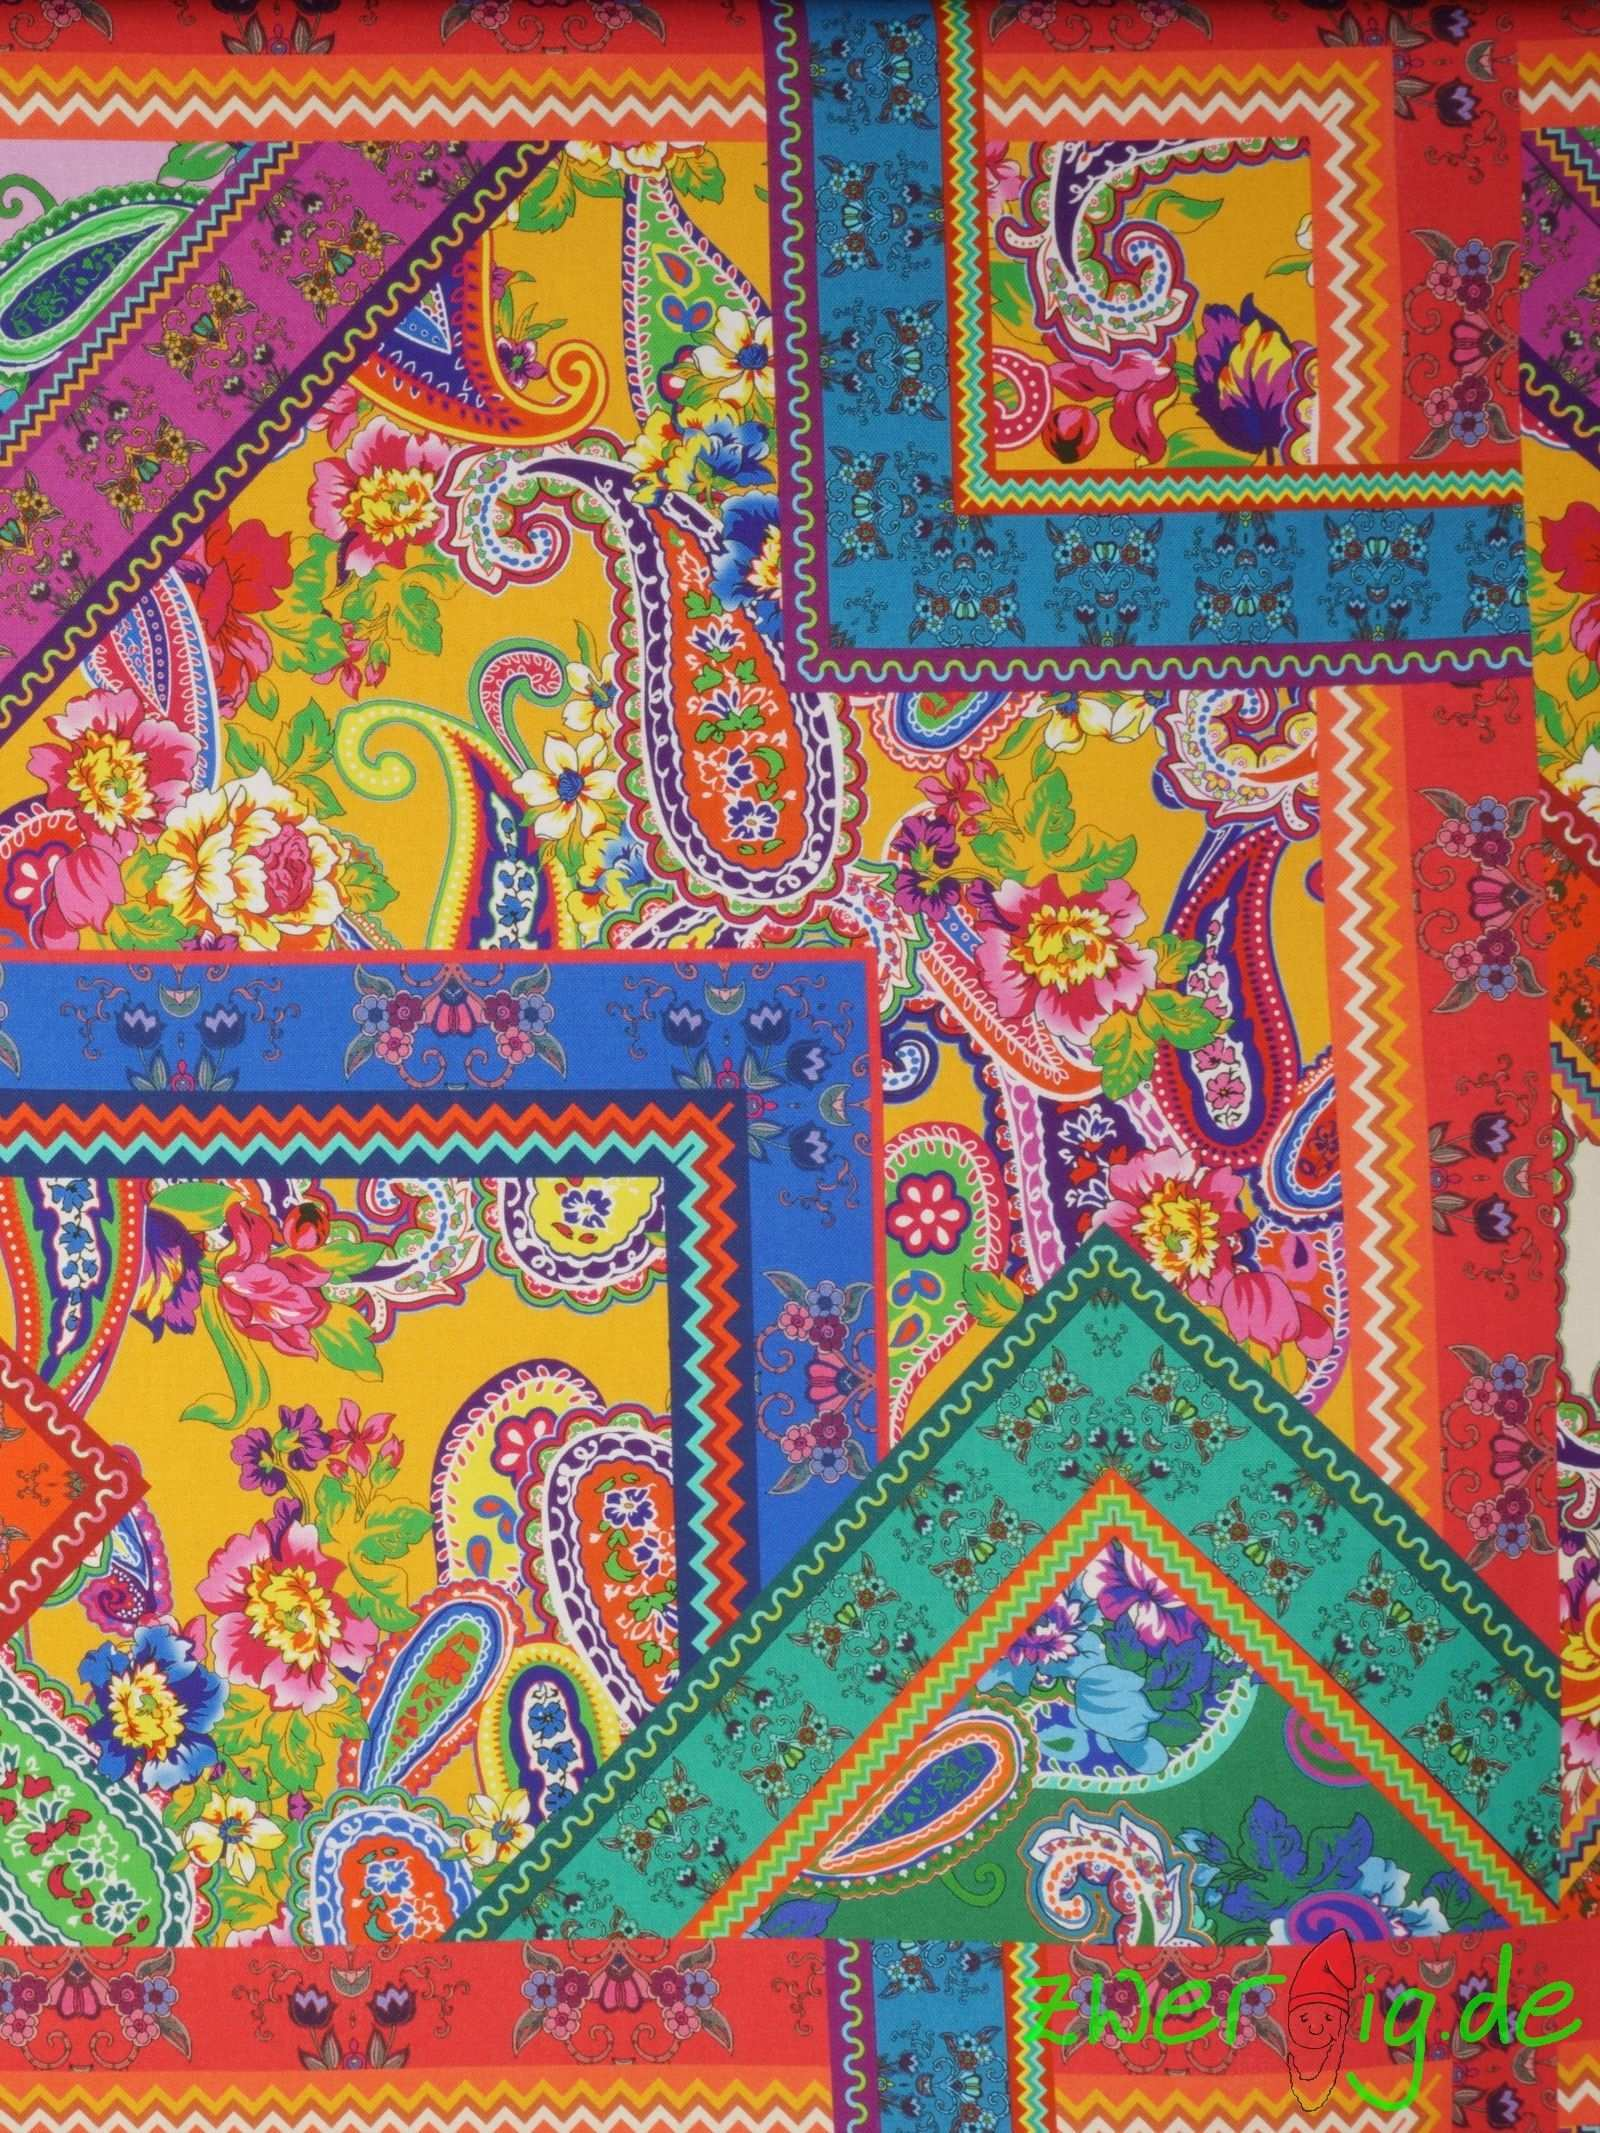 Feste Baumwolle Stoff Bunt Paisley Folklore 100 Pure Cotton Quilts Blanket